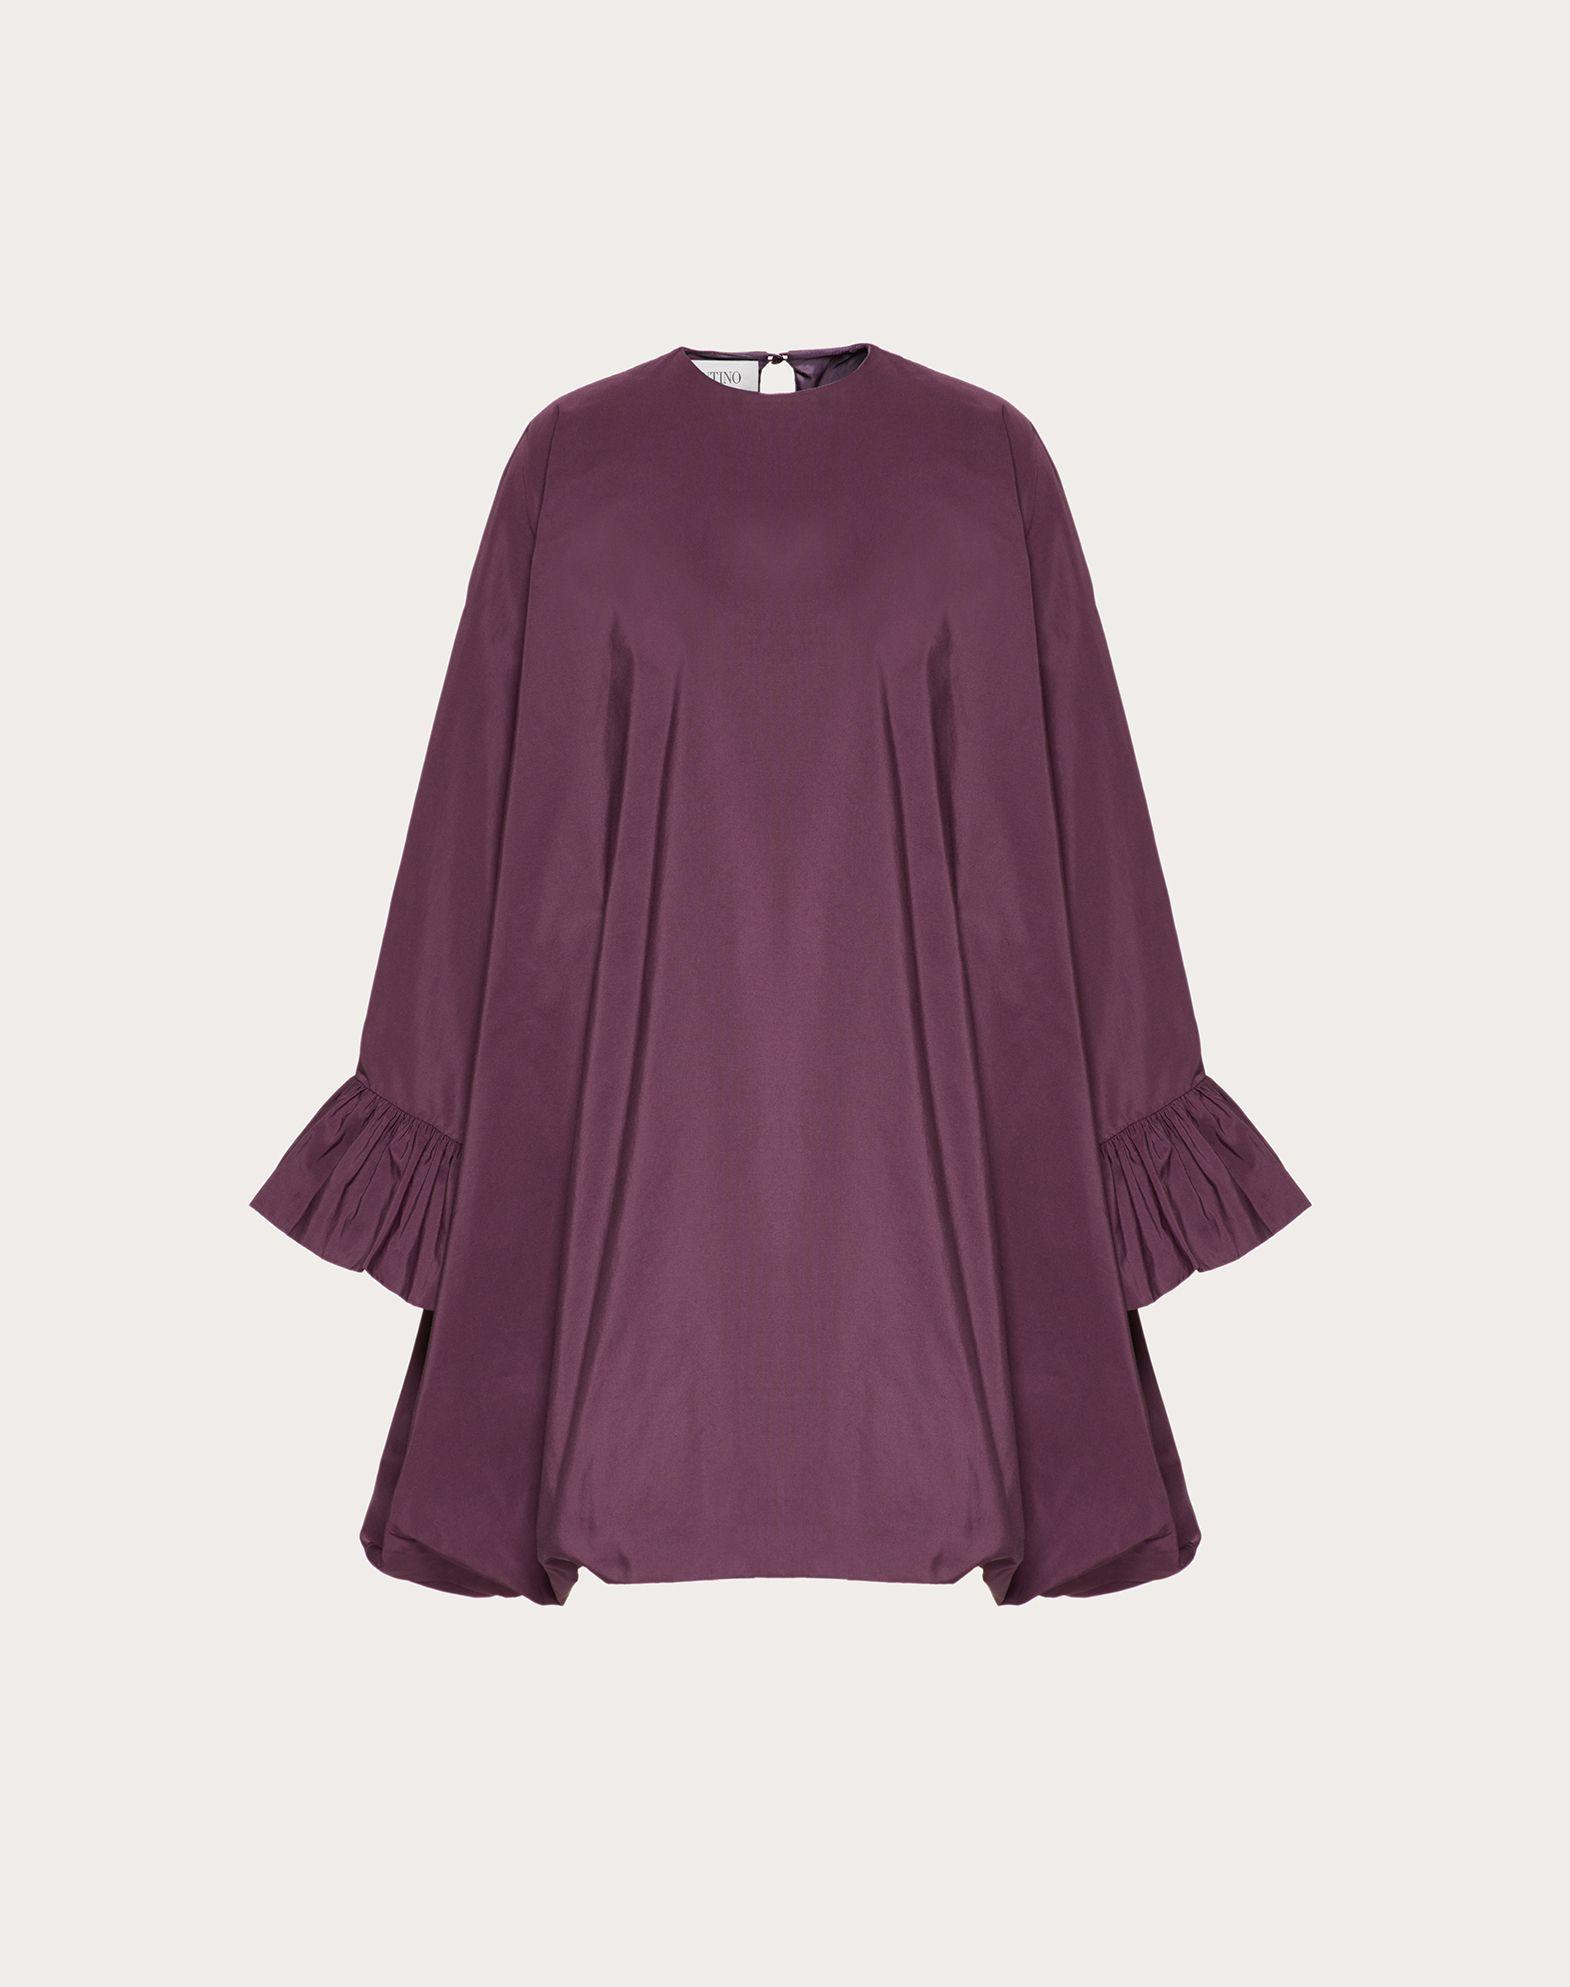 Cape-Kleid aus Micro Faille